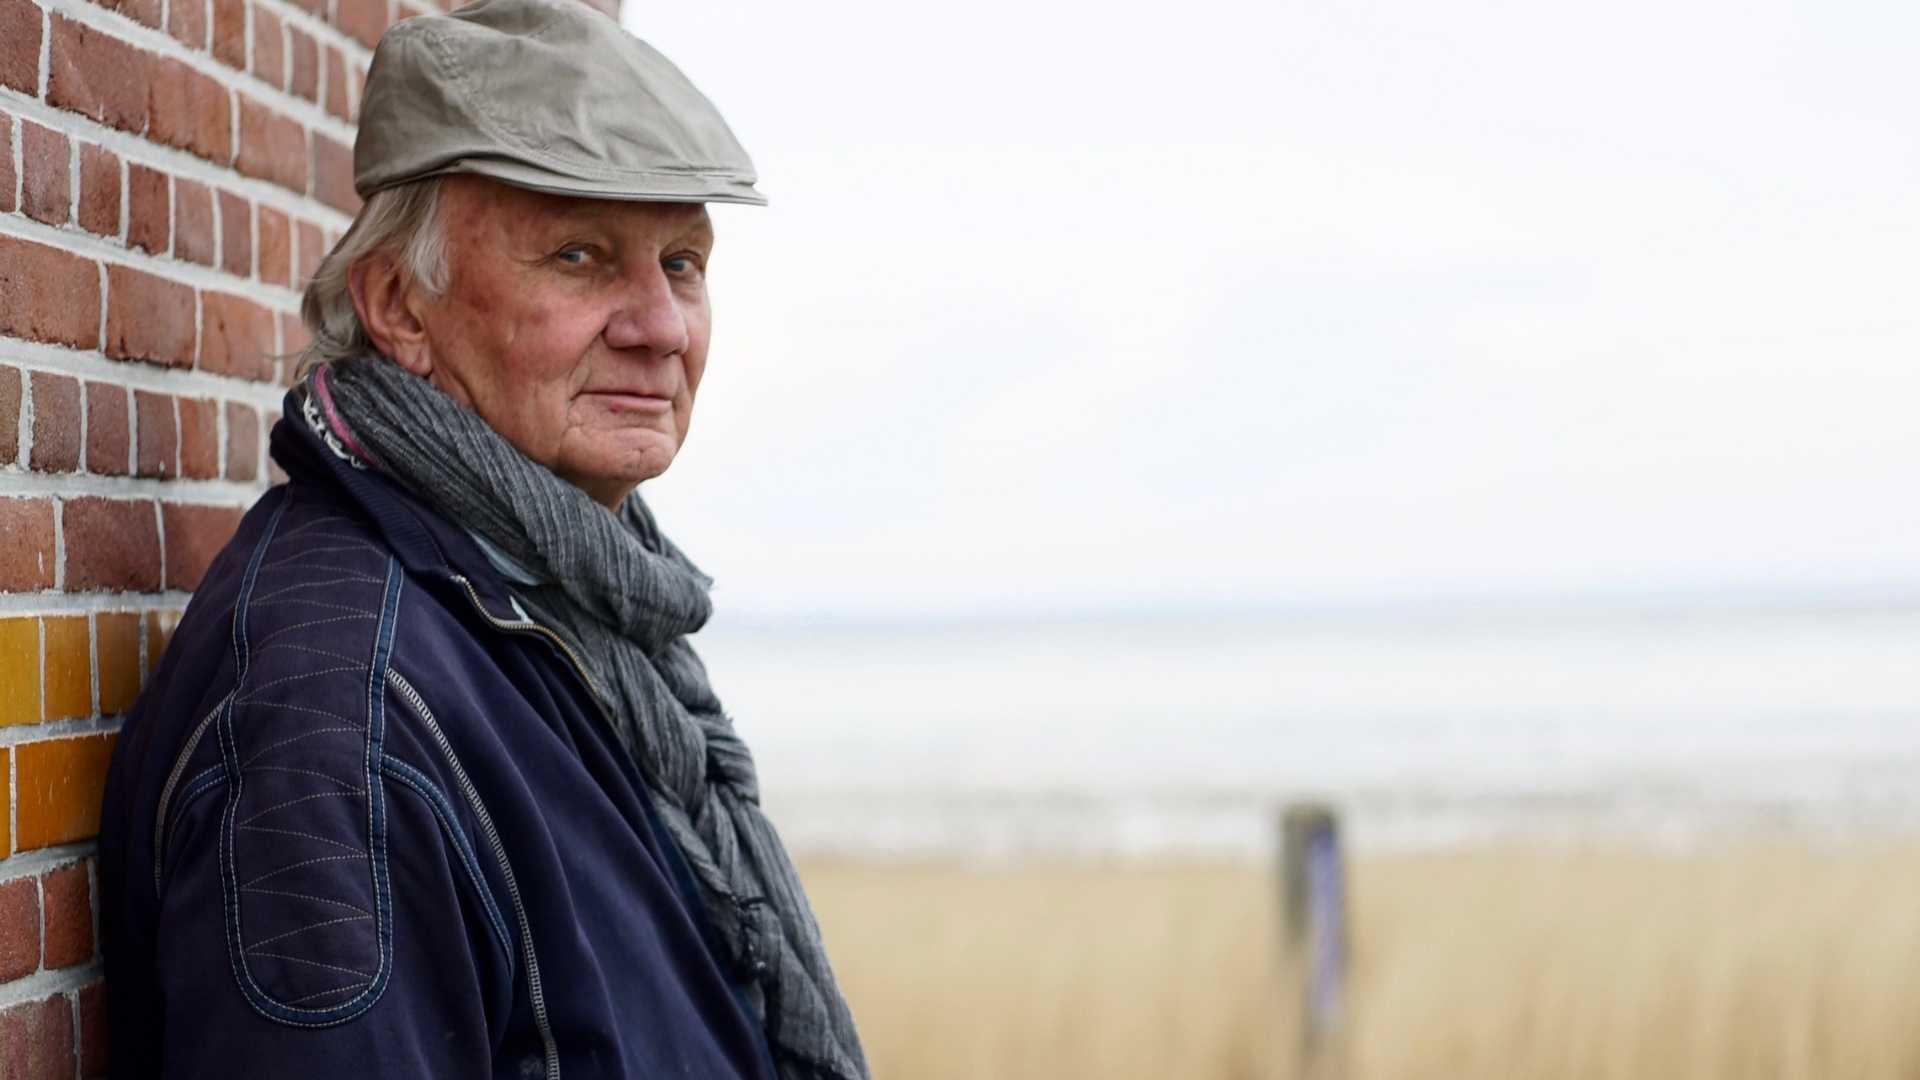 Trotse Noord-Hollander: Peter van Zutphen